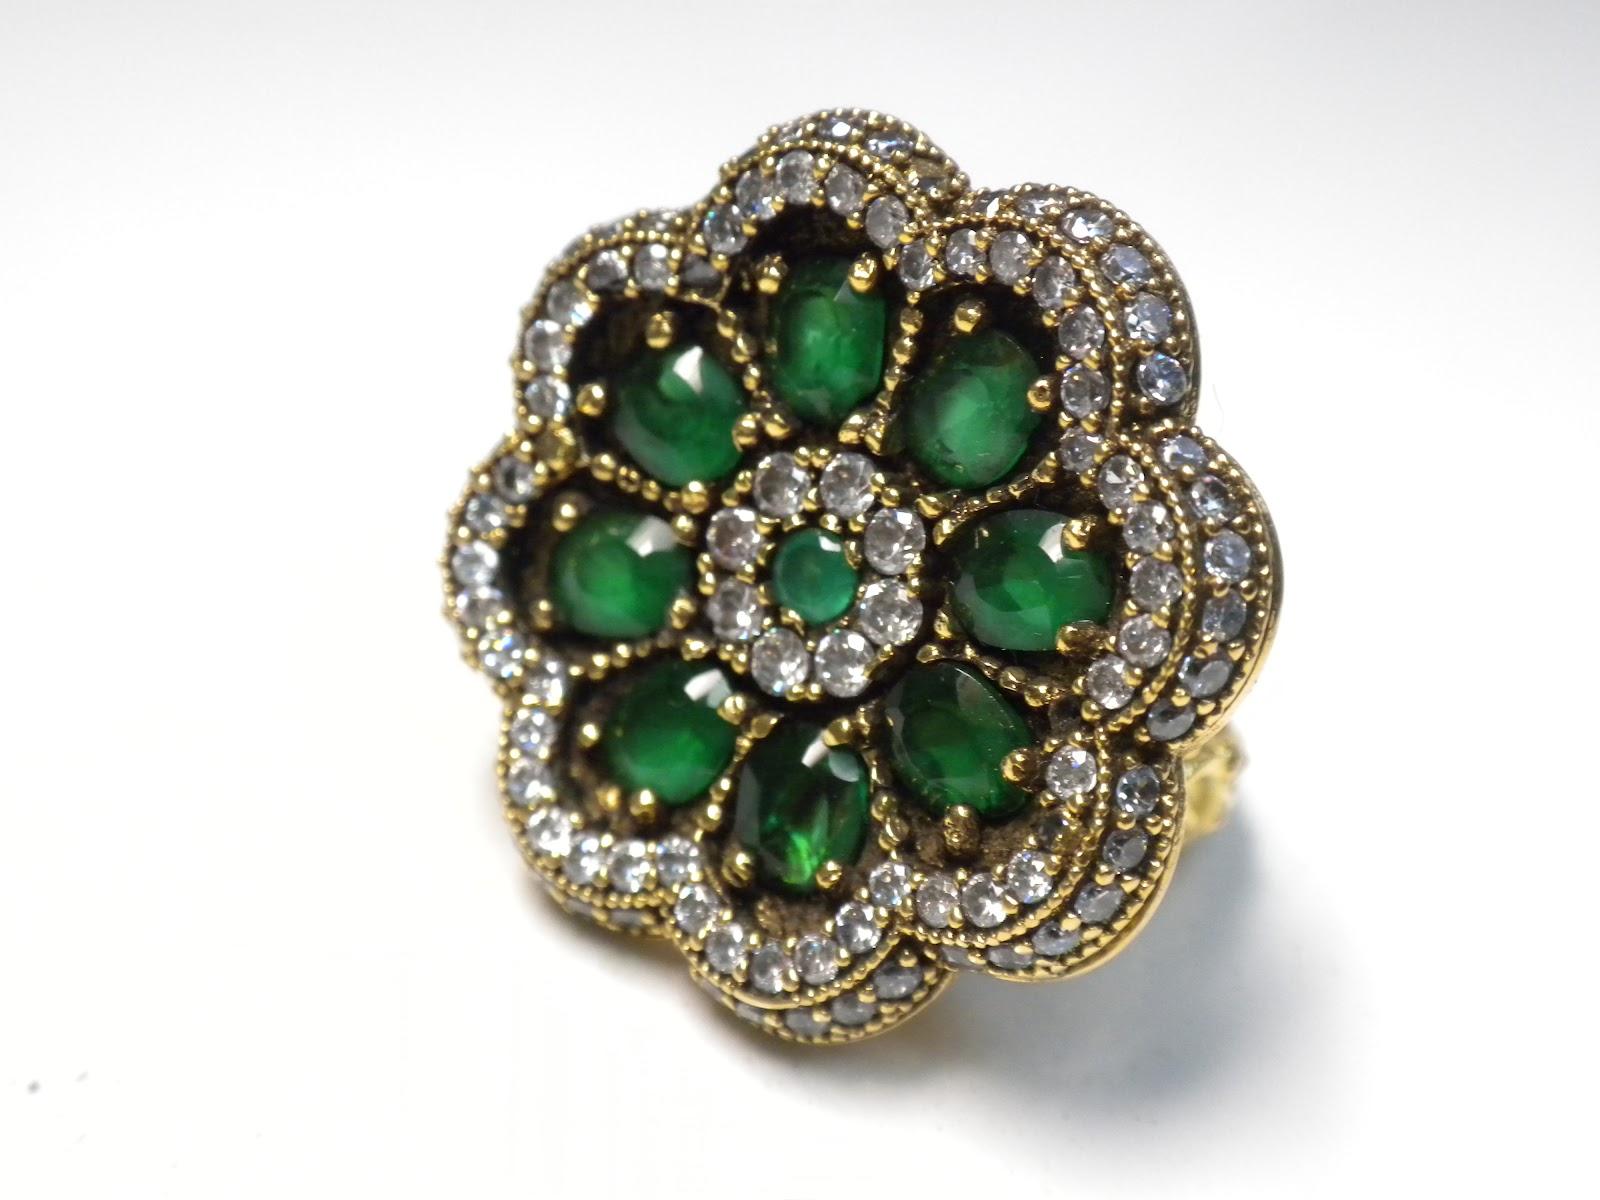 Grand bazaar jewelers wholesale designer jewelry for Unique handmade jewelry wholesale